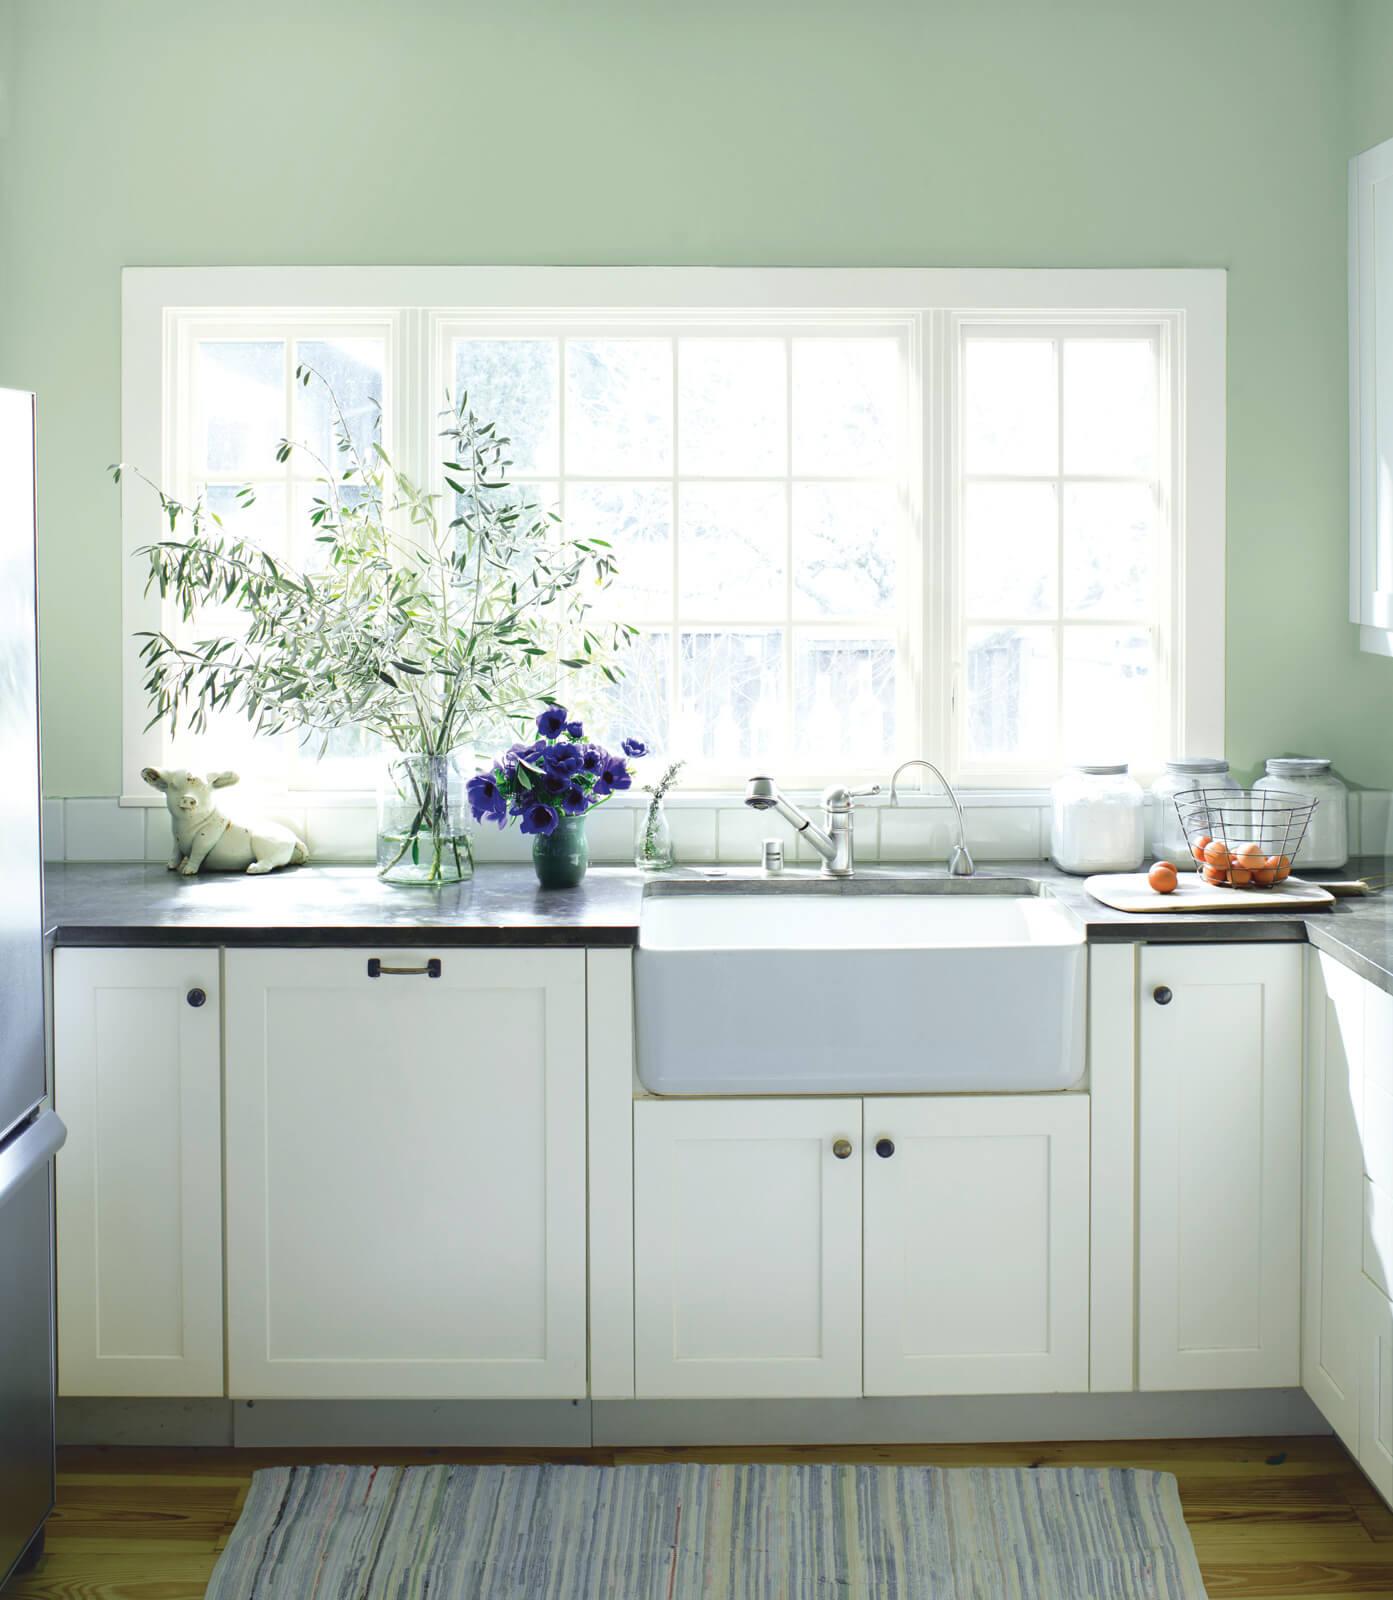 Tudor_Kitchen_with_big_window.jpg